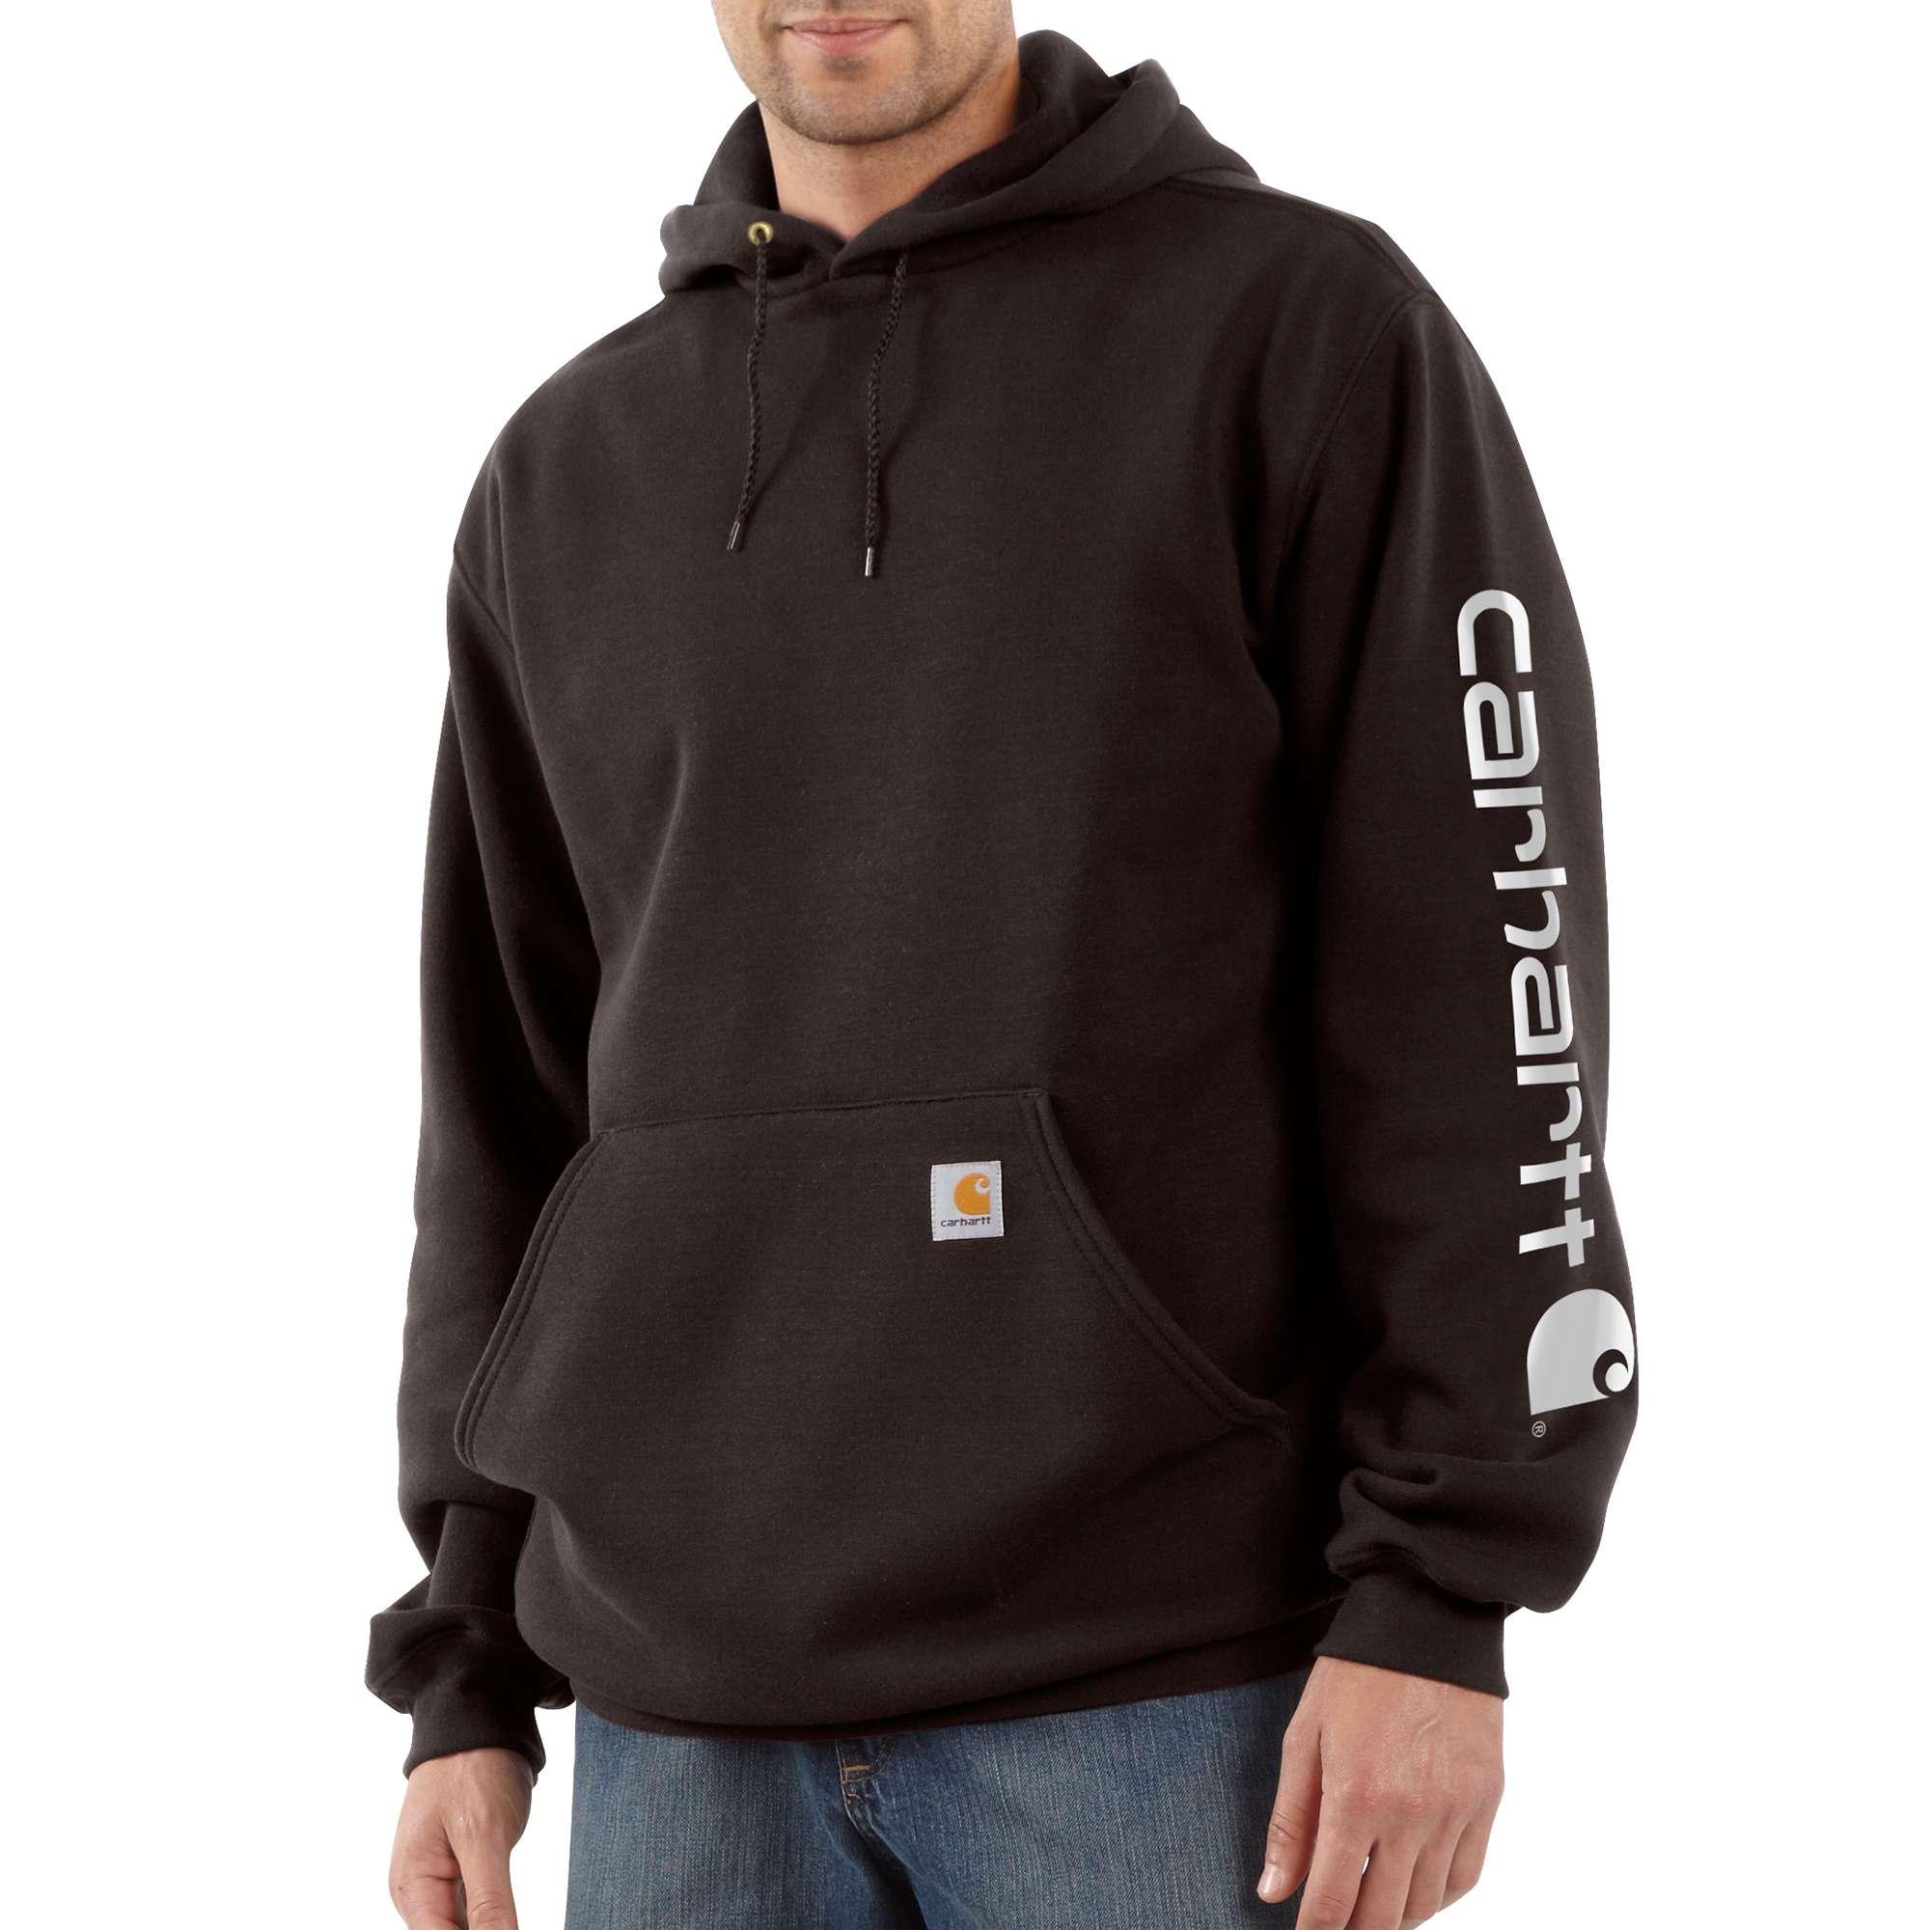 Men's Signature Sleeve Logo Hooded Sweatshirt, Dark Brown,Dark Natural, swatch